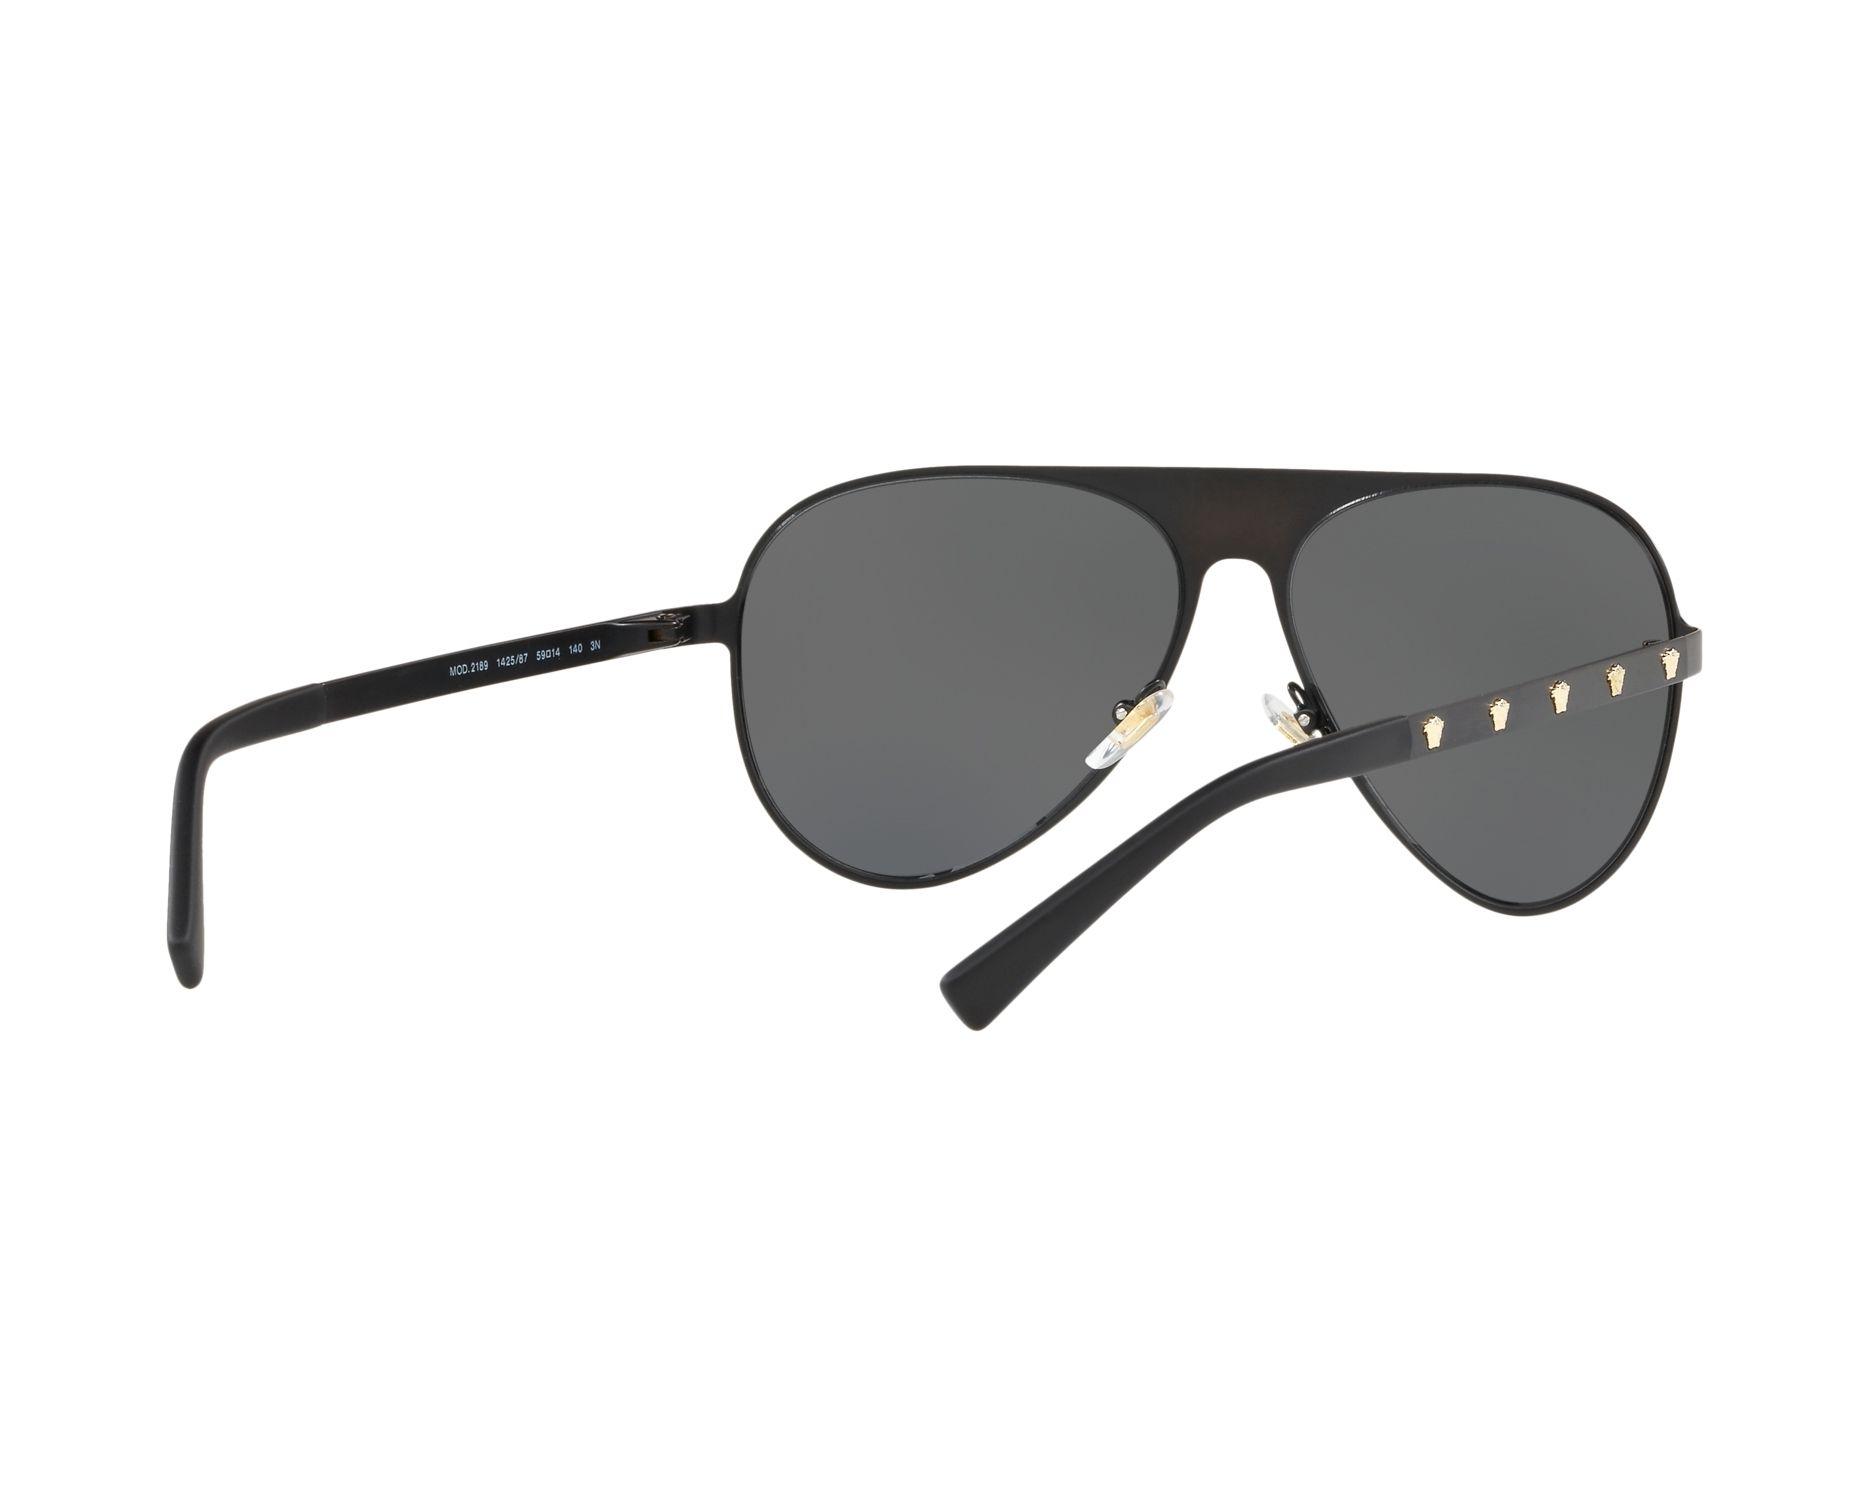 8ca9f26d5c0 Sunglasses Versace VE-2189 142587 59-14 Black Gold 360 degree view 8